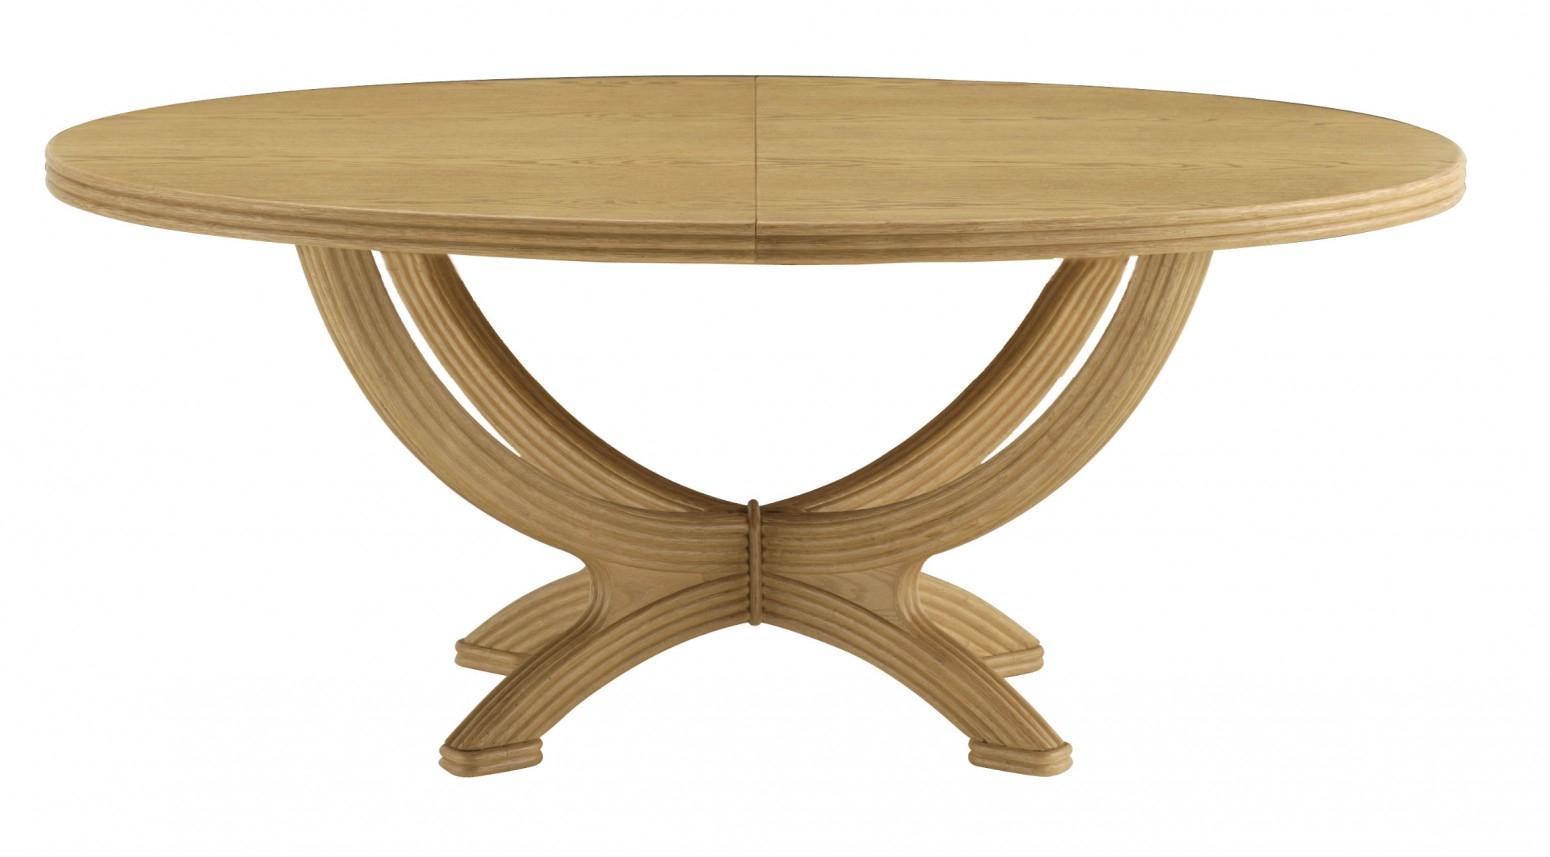 Table De Jardin Avec Rallonge Table Ovale Avec Rallonge Brin D Ouest